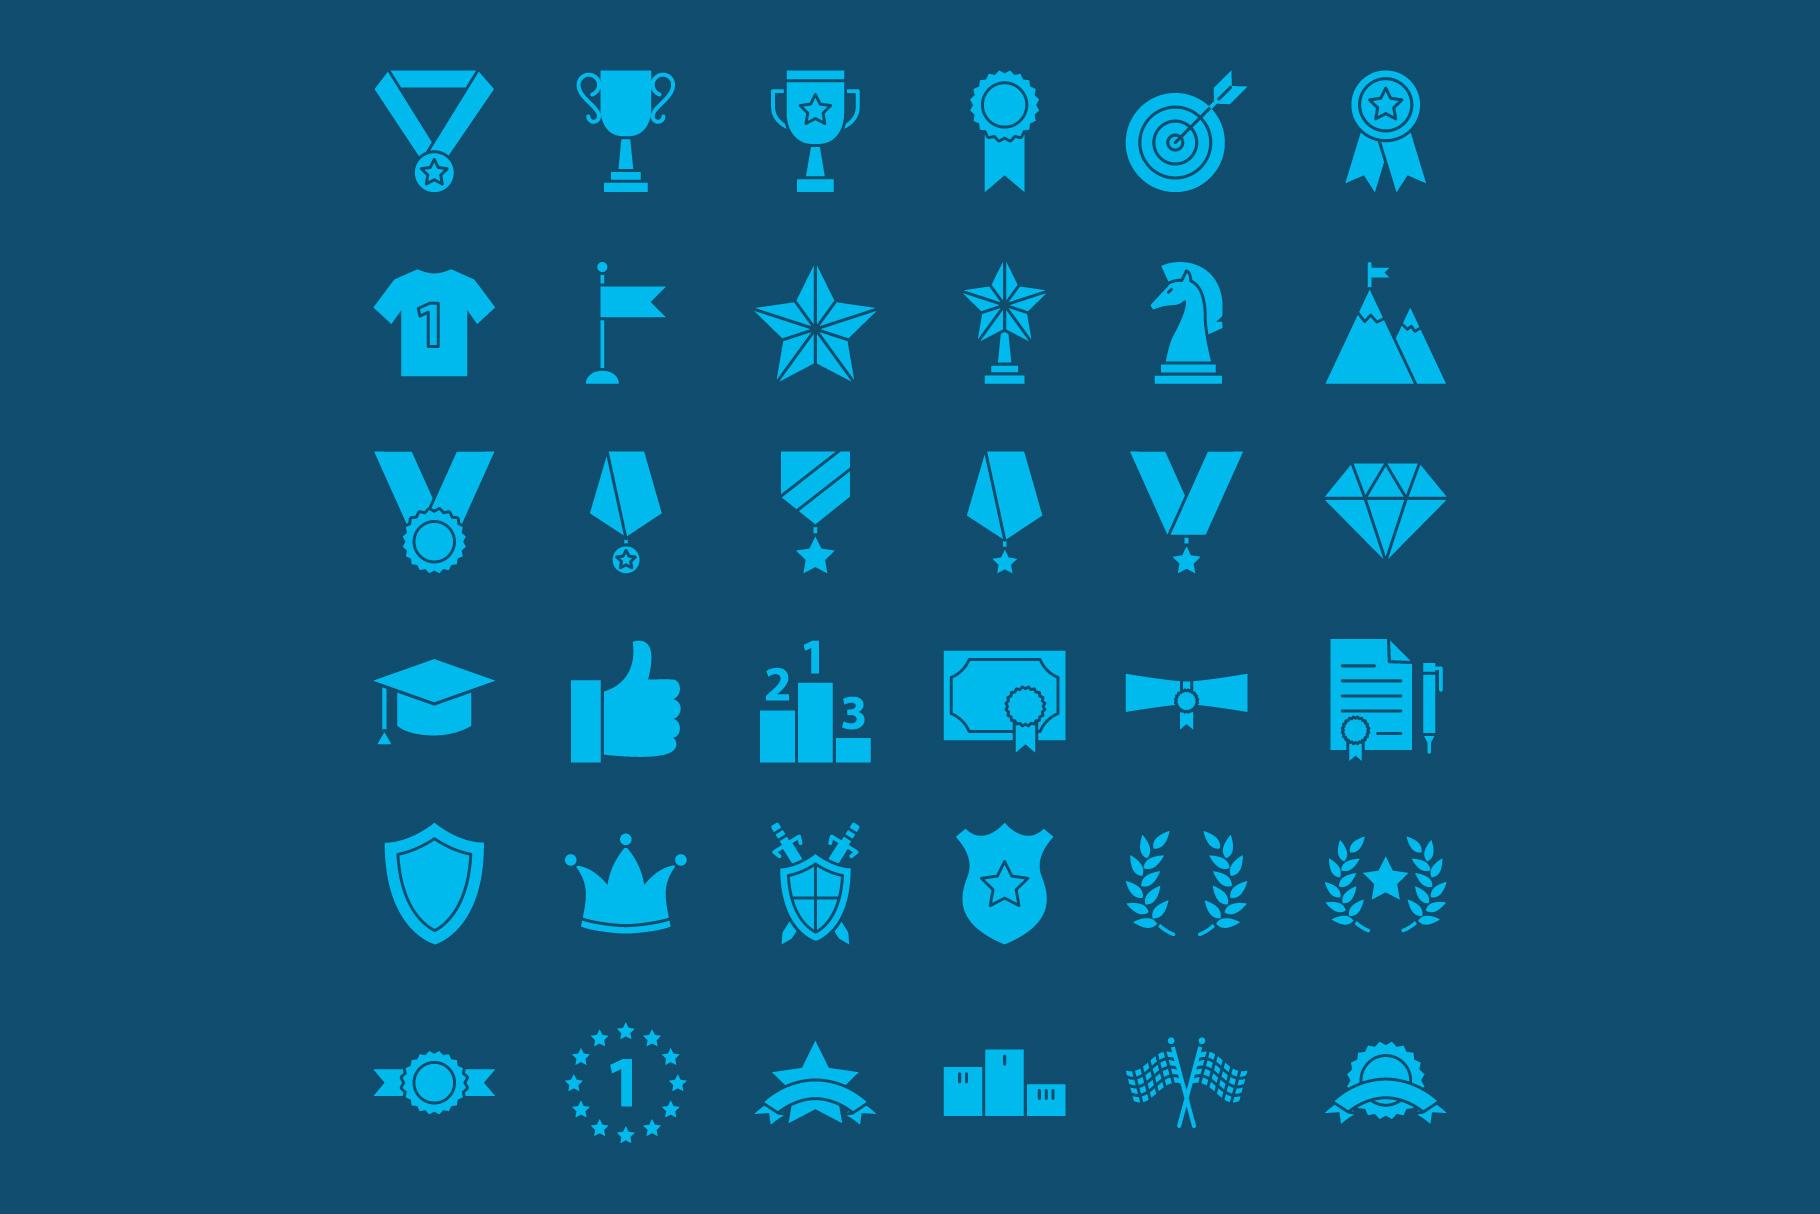 Award Line Art Icons example image 2